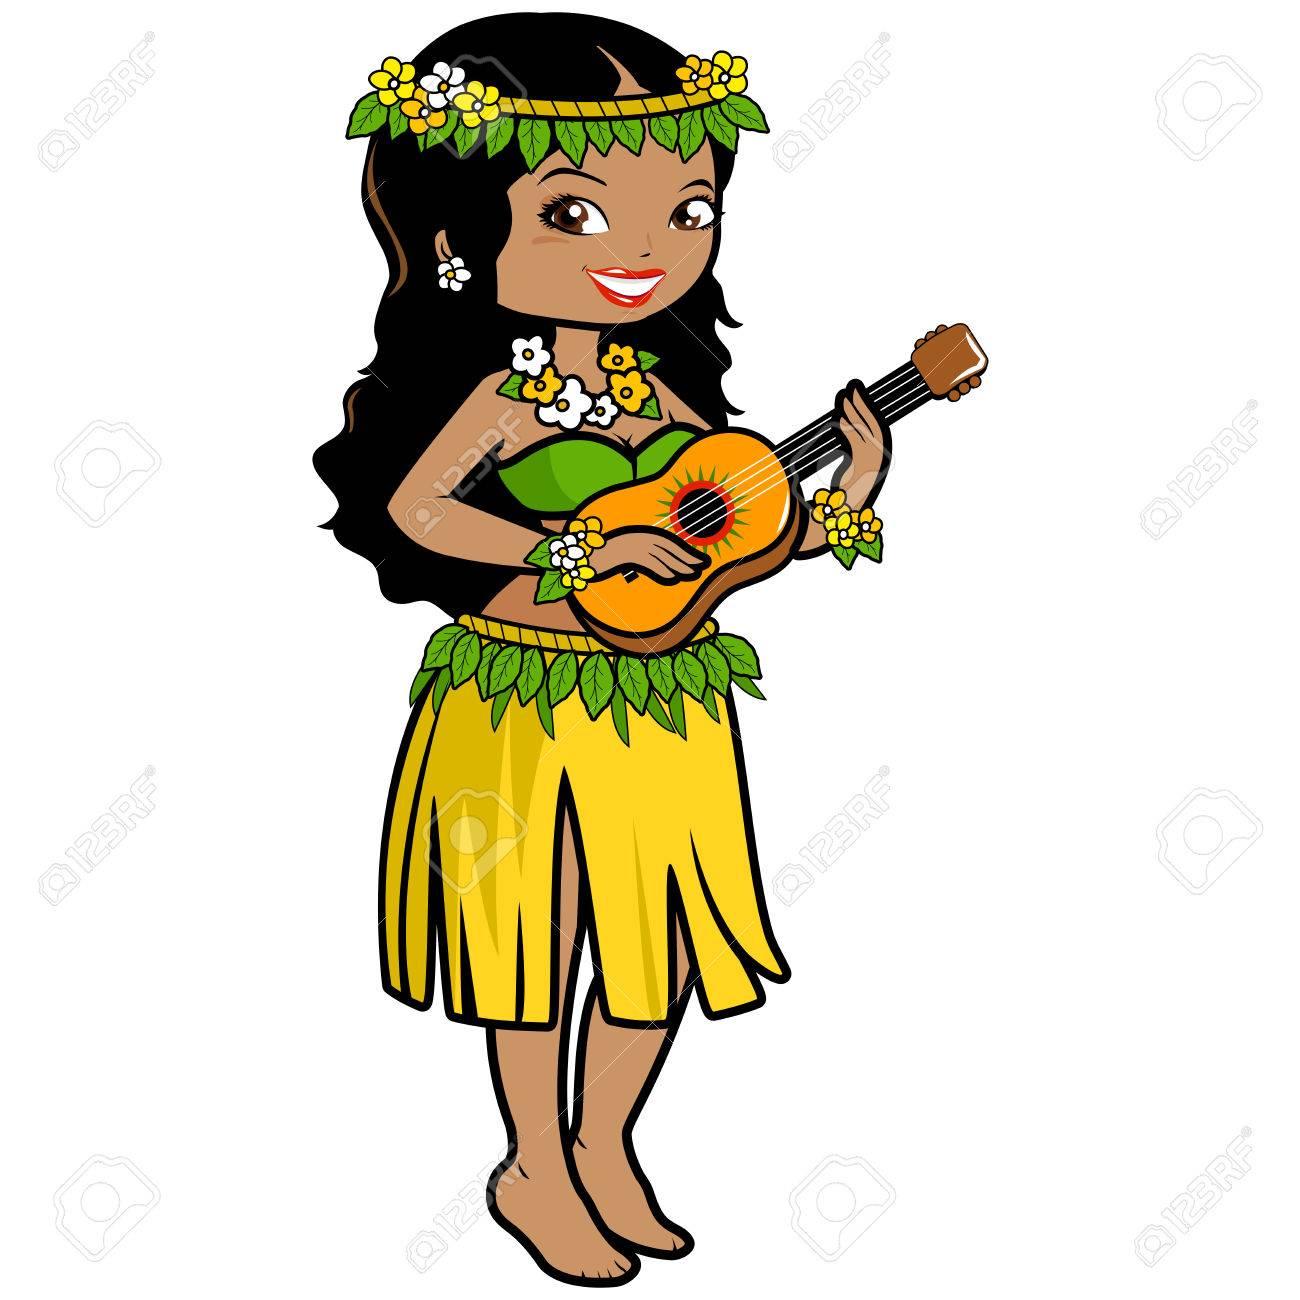 Hawaiian woman playing music with her guitar in a grass skirt hawaiian woman playing music with her guitar in a grass skirt and exotic flowers stock izmirmasajfo Gallery